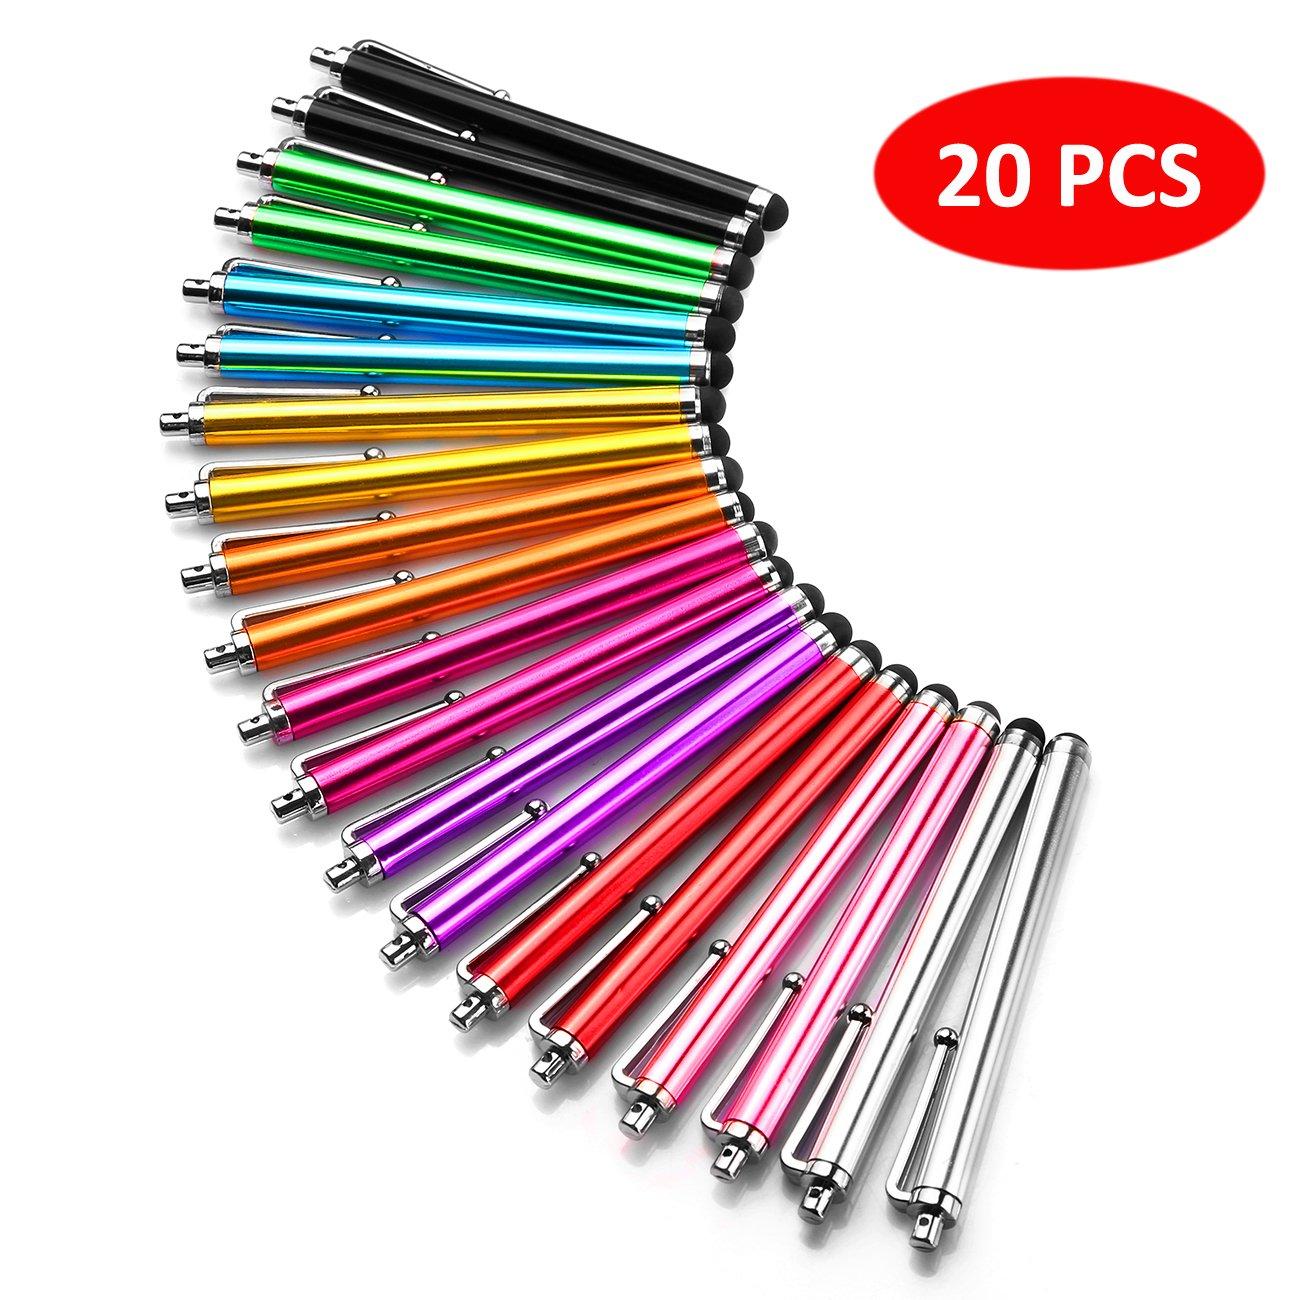 20 lapices stylus para tablets y celulares, universal